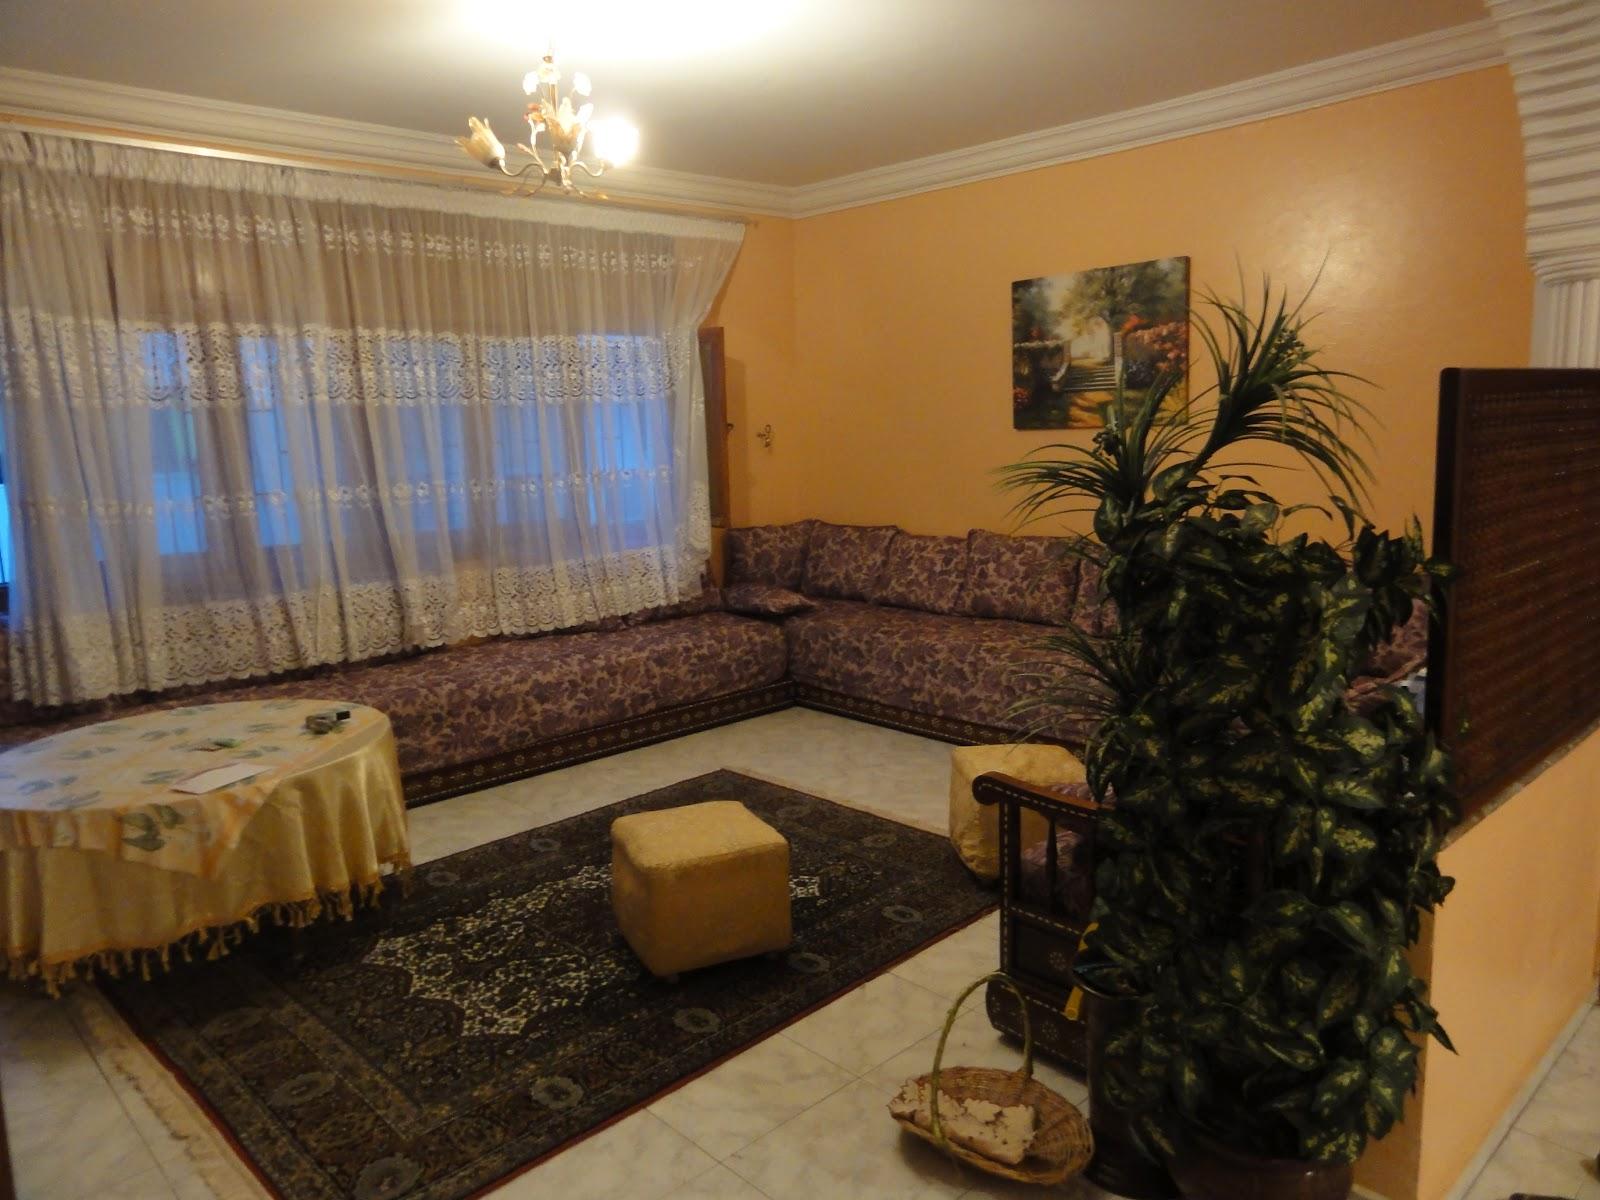 Beautiful Moderne Marokkanische Wohnzimmer Photos - Ridgewayng.com ...